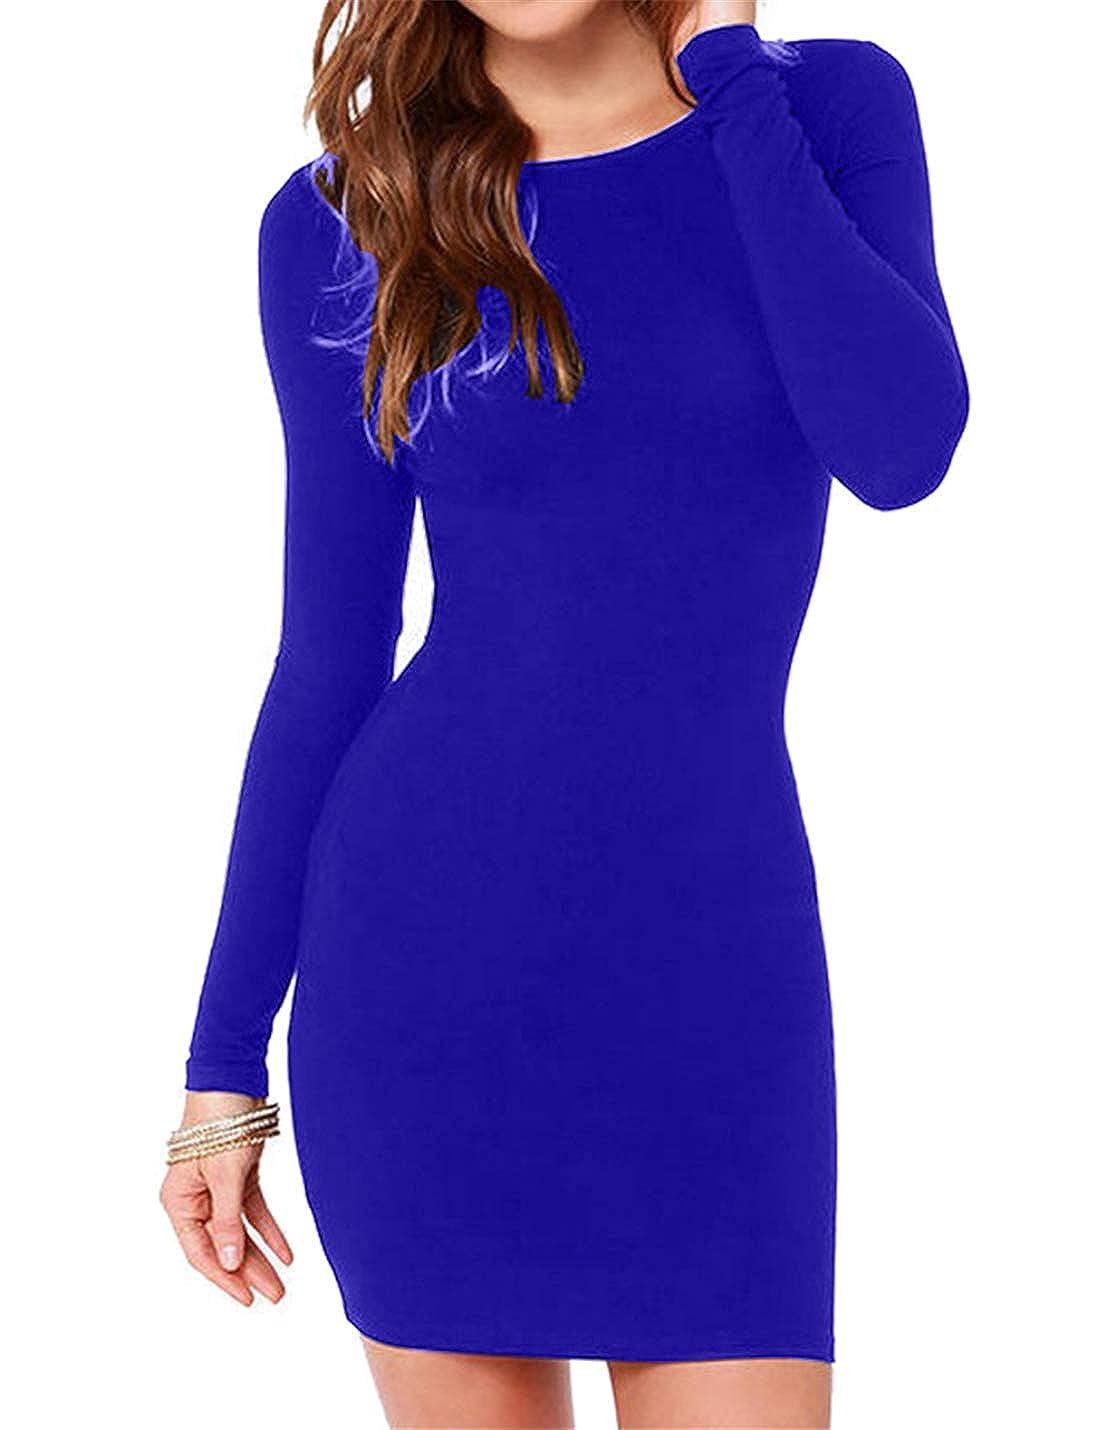 bluee Hioinieiy Women's Casual Crew Neck Long Sleeve Bodycon Short Dress